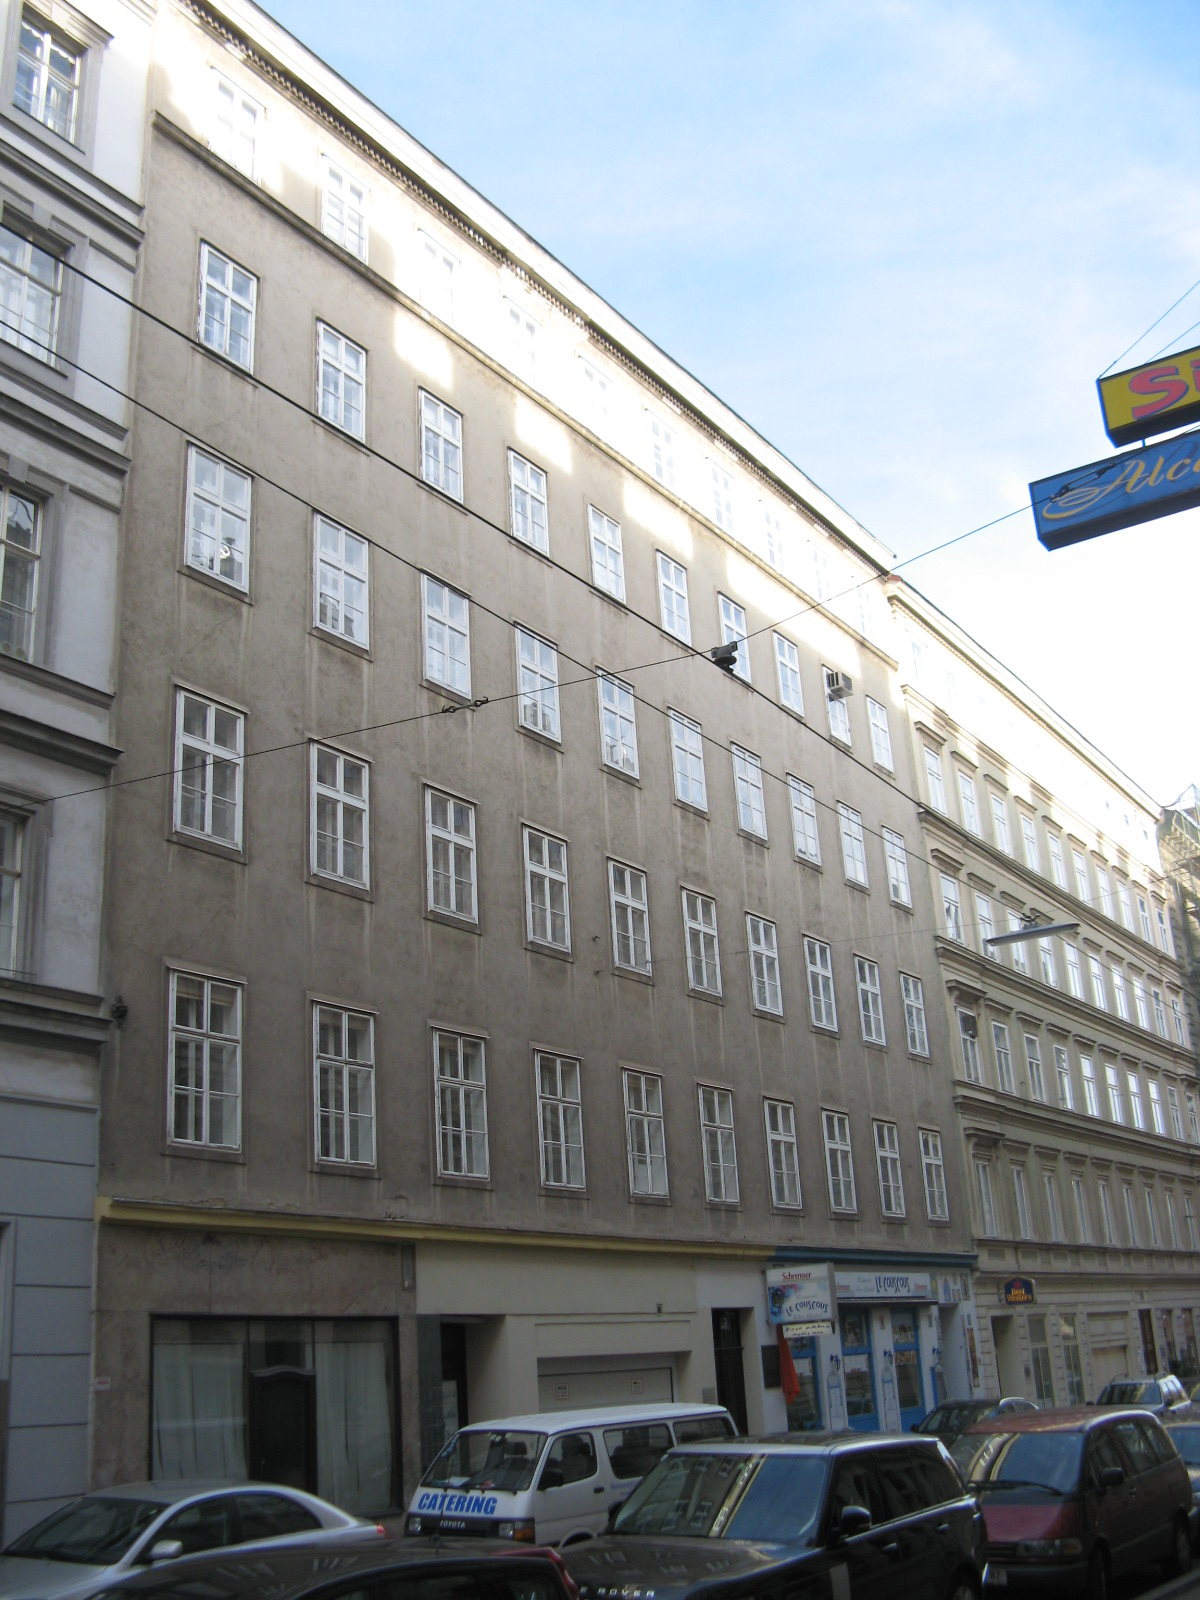 Bösendorferstraße 05.JPG